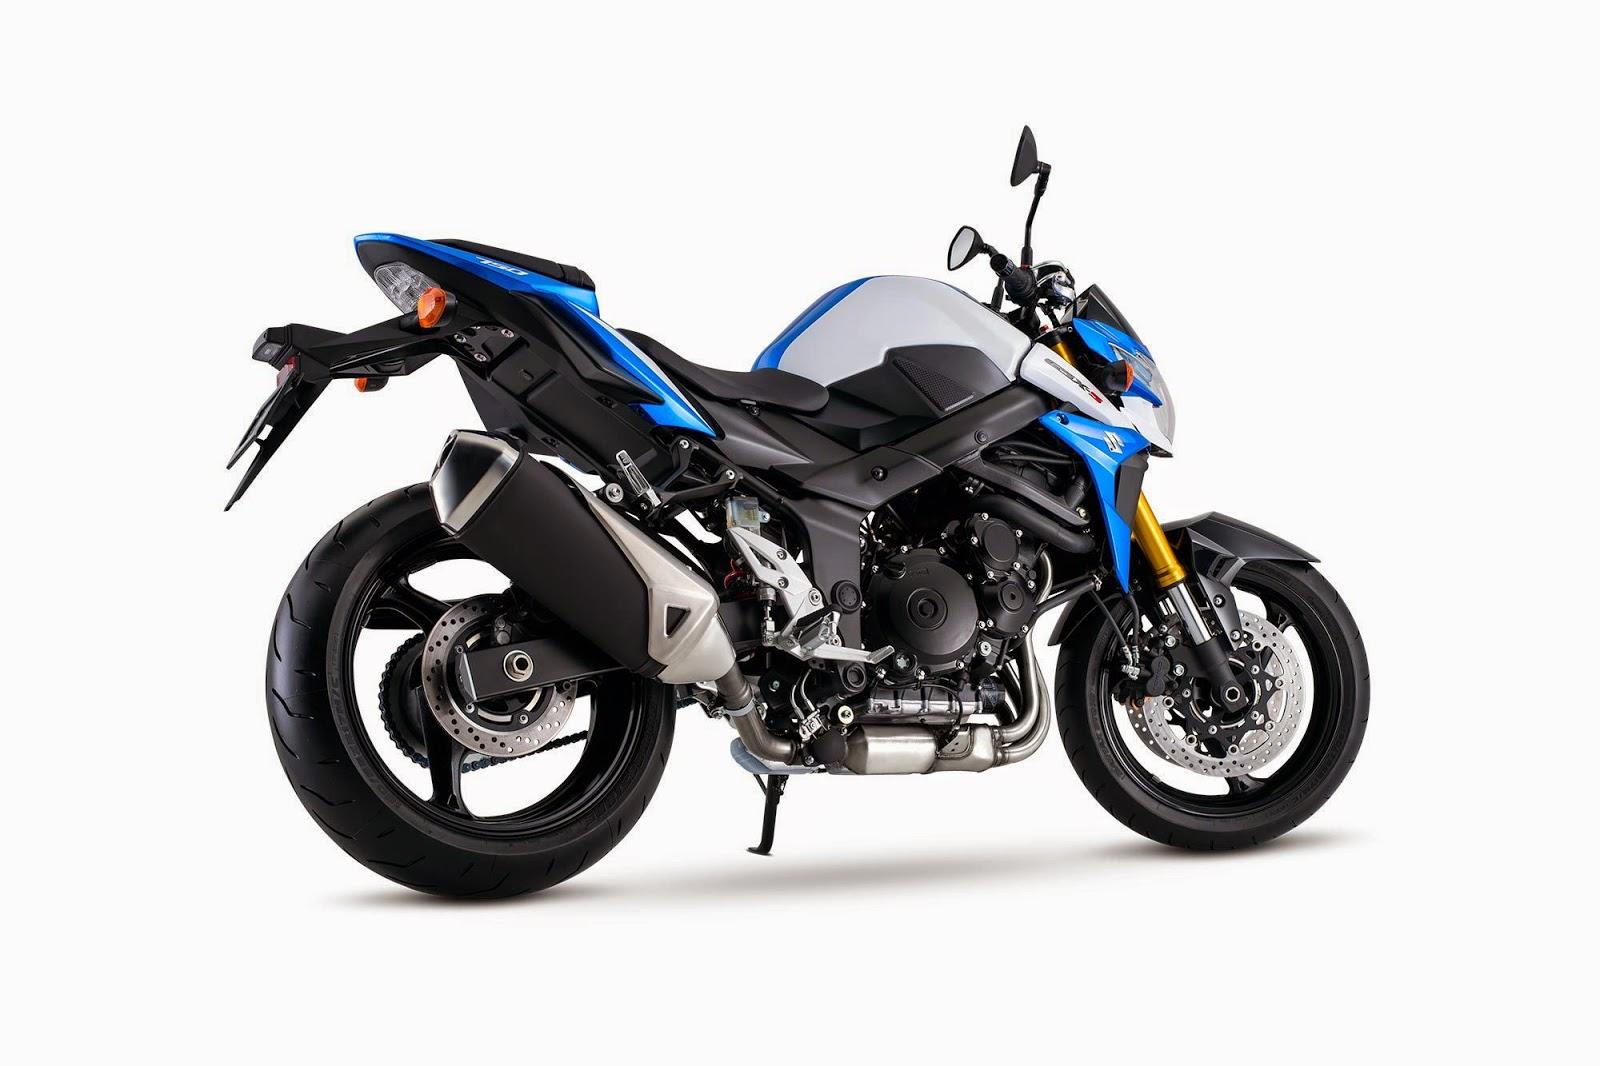 newly unveiled 2015 suzuki gsx s750z and gsx s750 bike. Black Bedroom Furniture Sets. Home Design Ideas